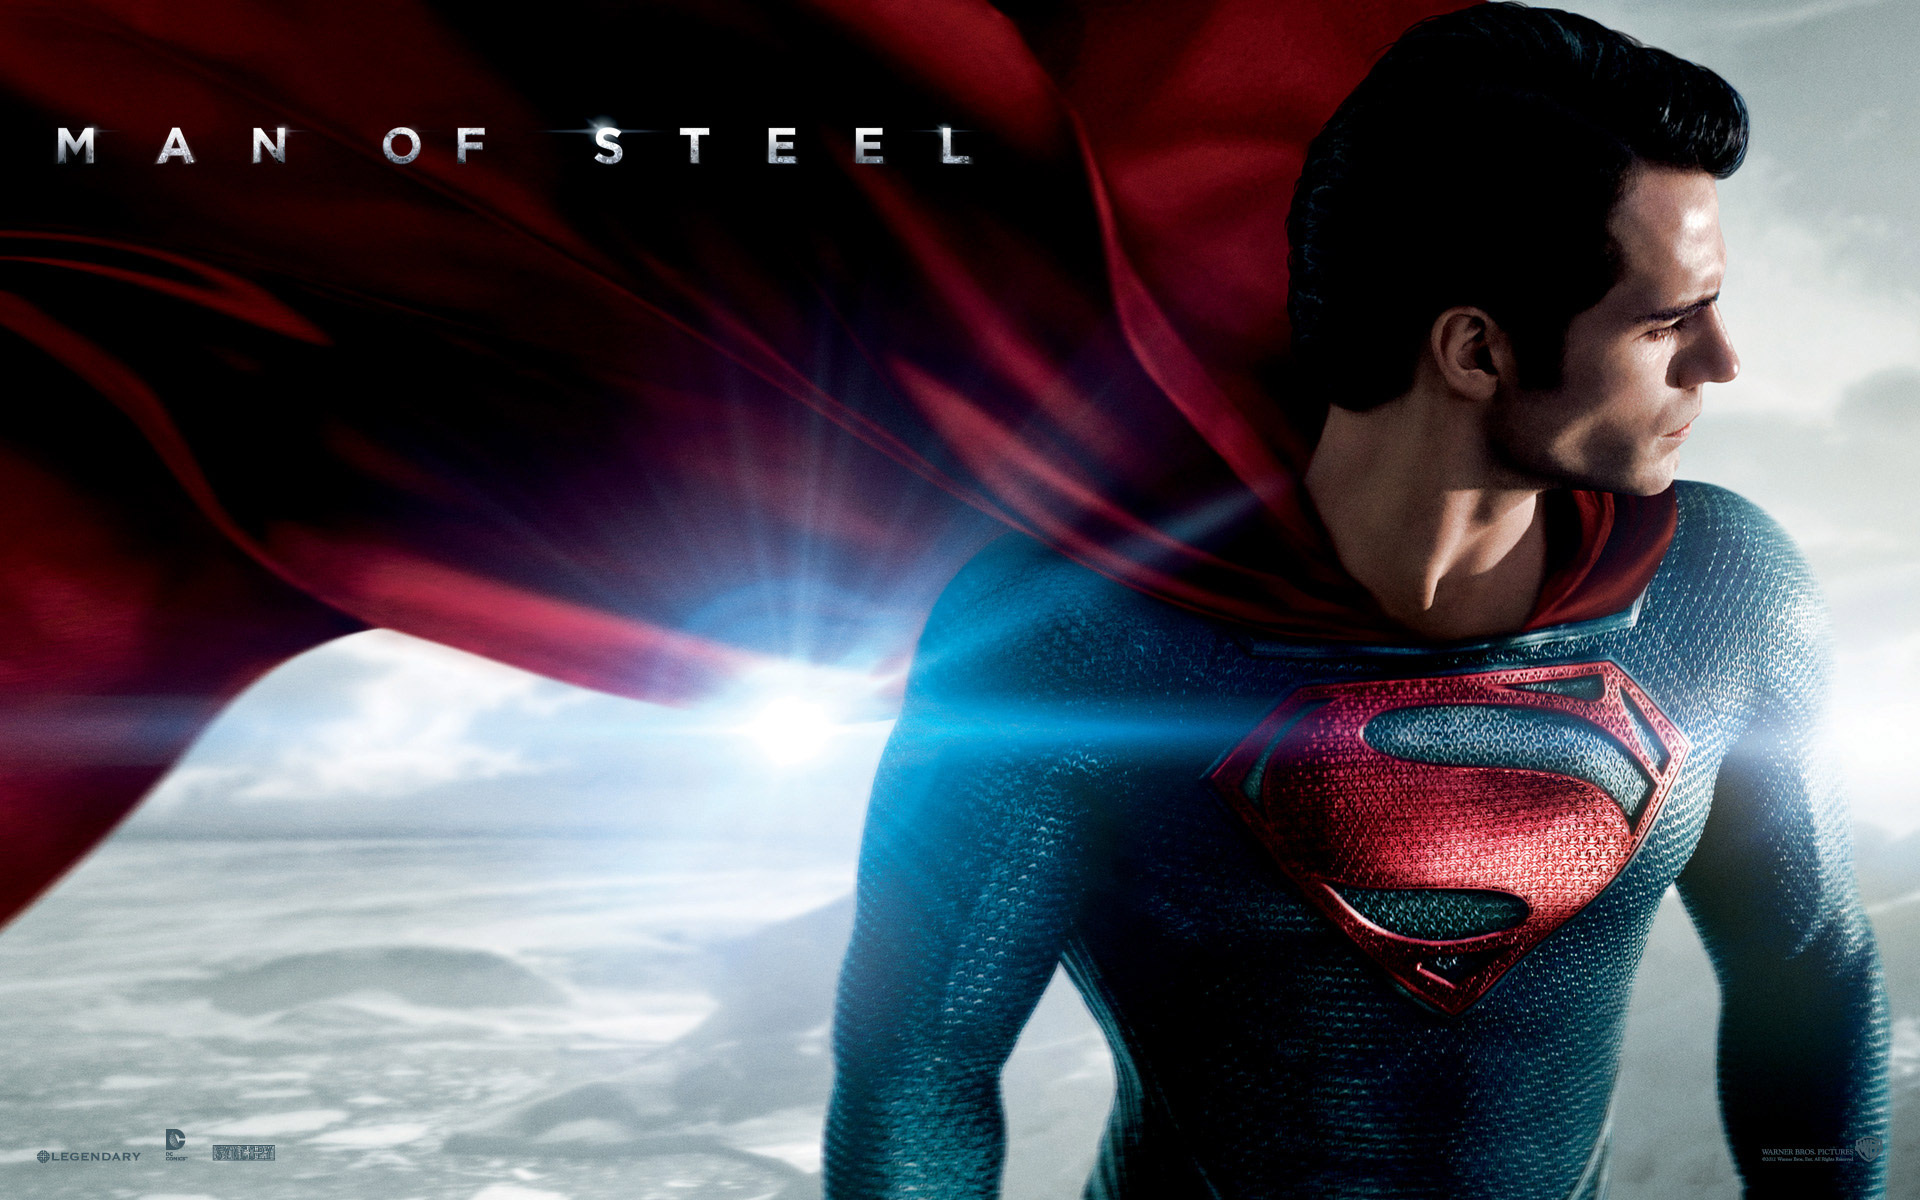 Superman Man Of Steel 2013 Movie Wallpapers Hd Designbolts